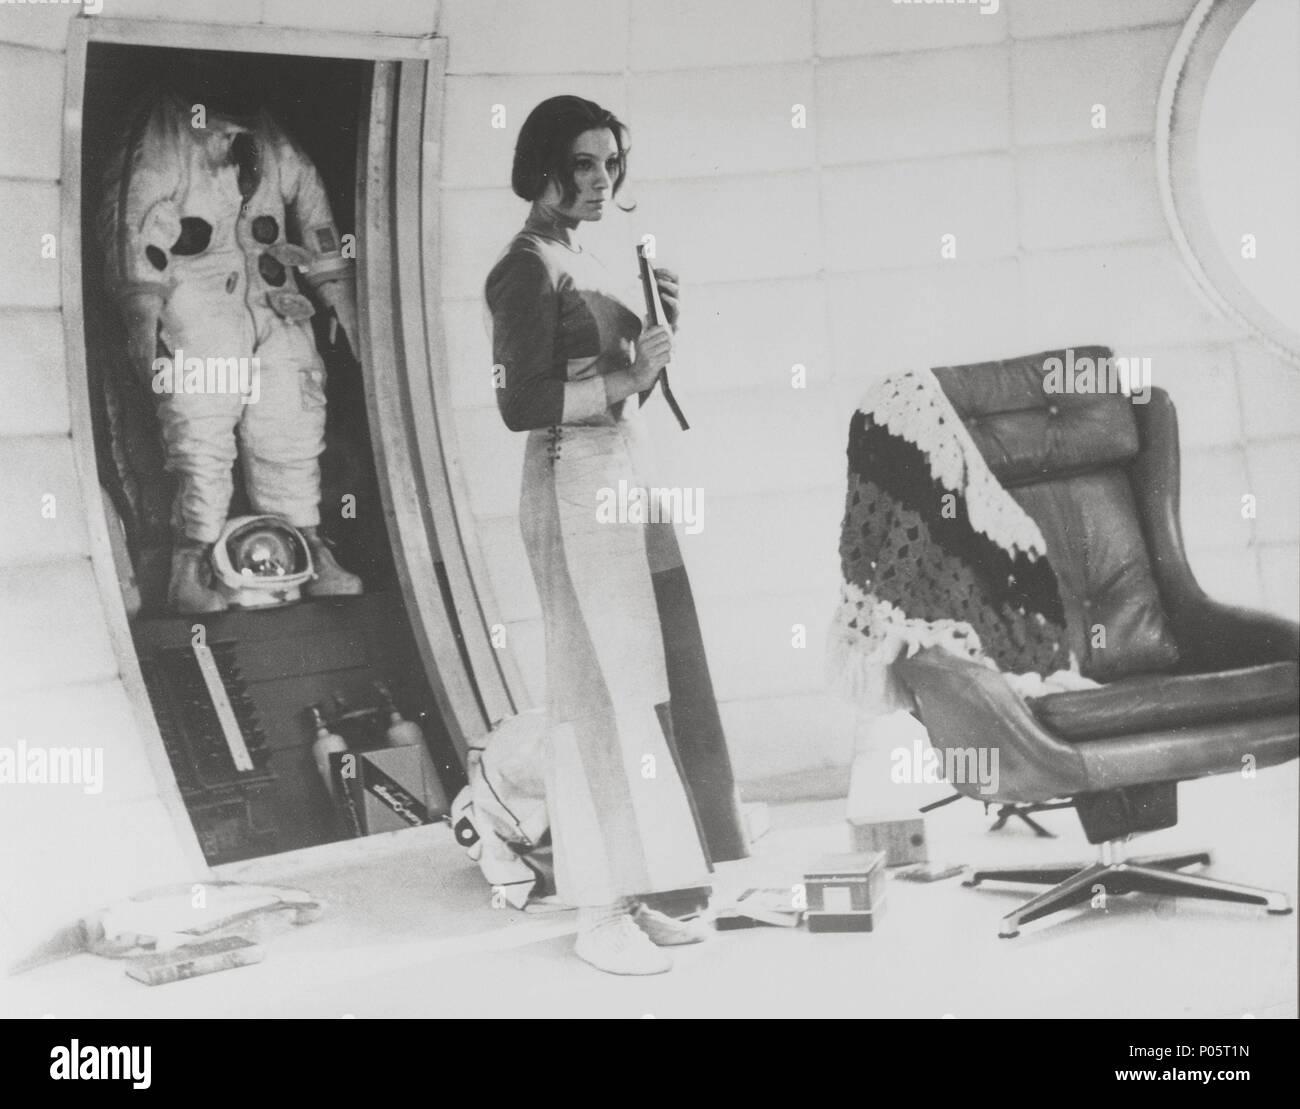 Original Film Title: SOLYARIS.  English Title: SOLARIS.  Film Director: ANDREI TARKOVSKY.  Year: 1972. Credit: MOSFILM / Album Stock Photo